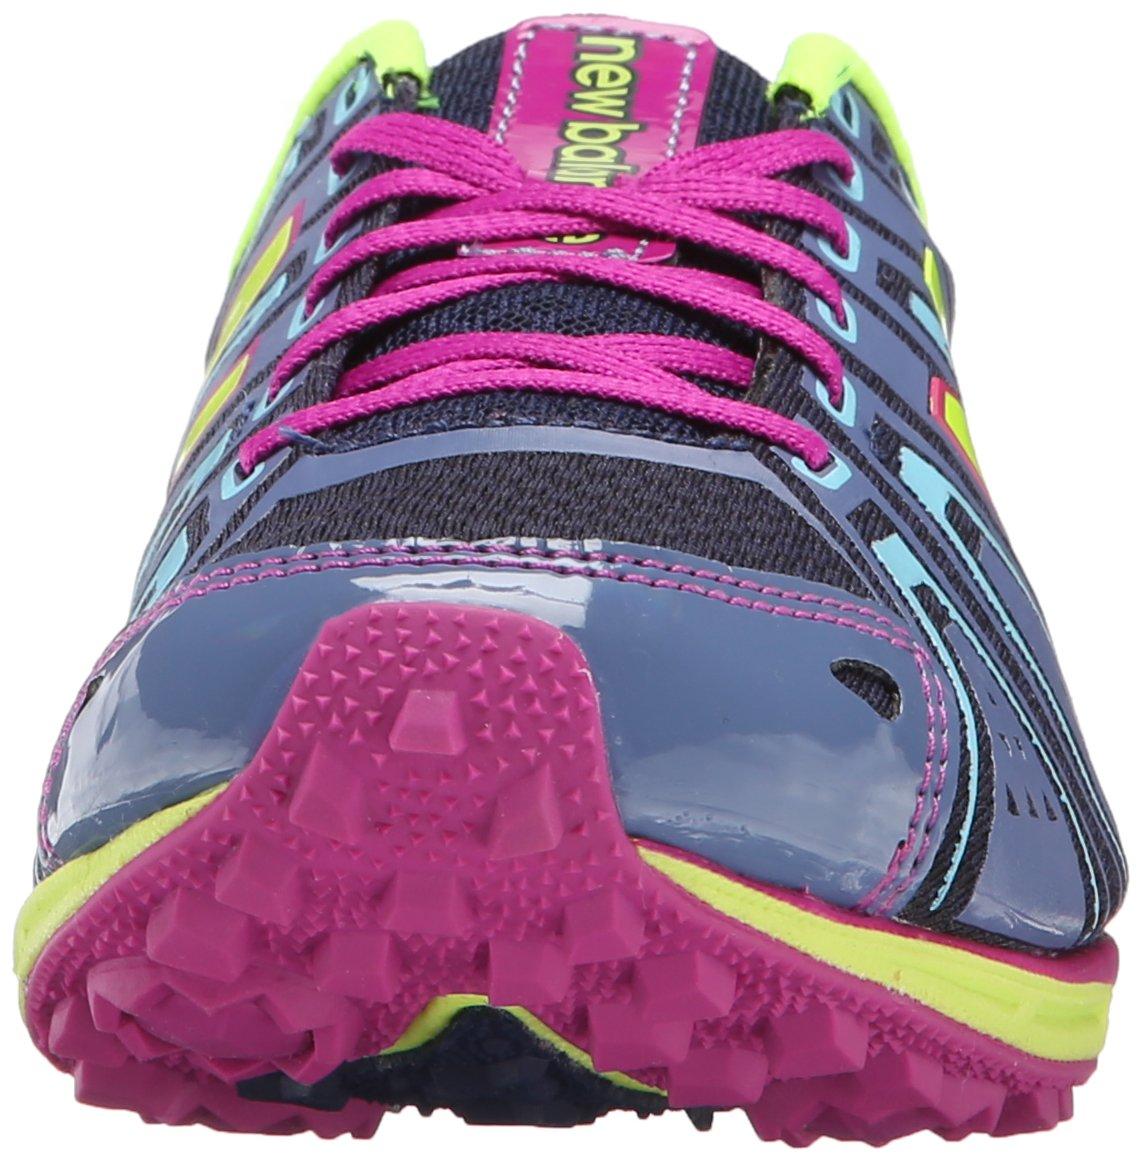 best sneakers 1d5fb 82099 ... Originals EQT Support ADV Adidas ADV Primeknit Hombres Zapatos casuales  ae74349 - asbook  New Zapatilla Balance Mujer New WXC700 Spikeless  Zapatilla de ...